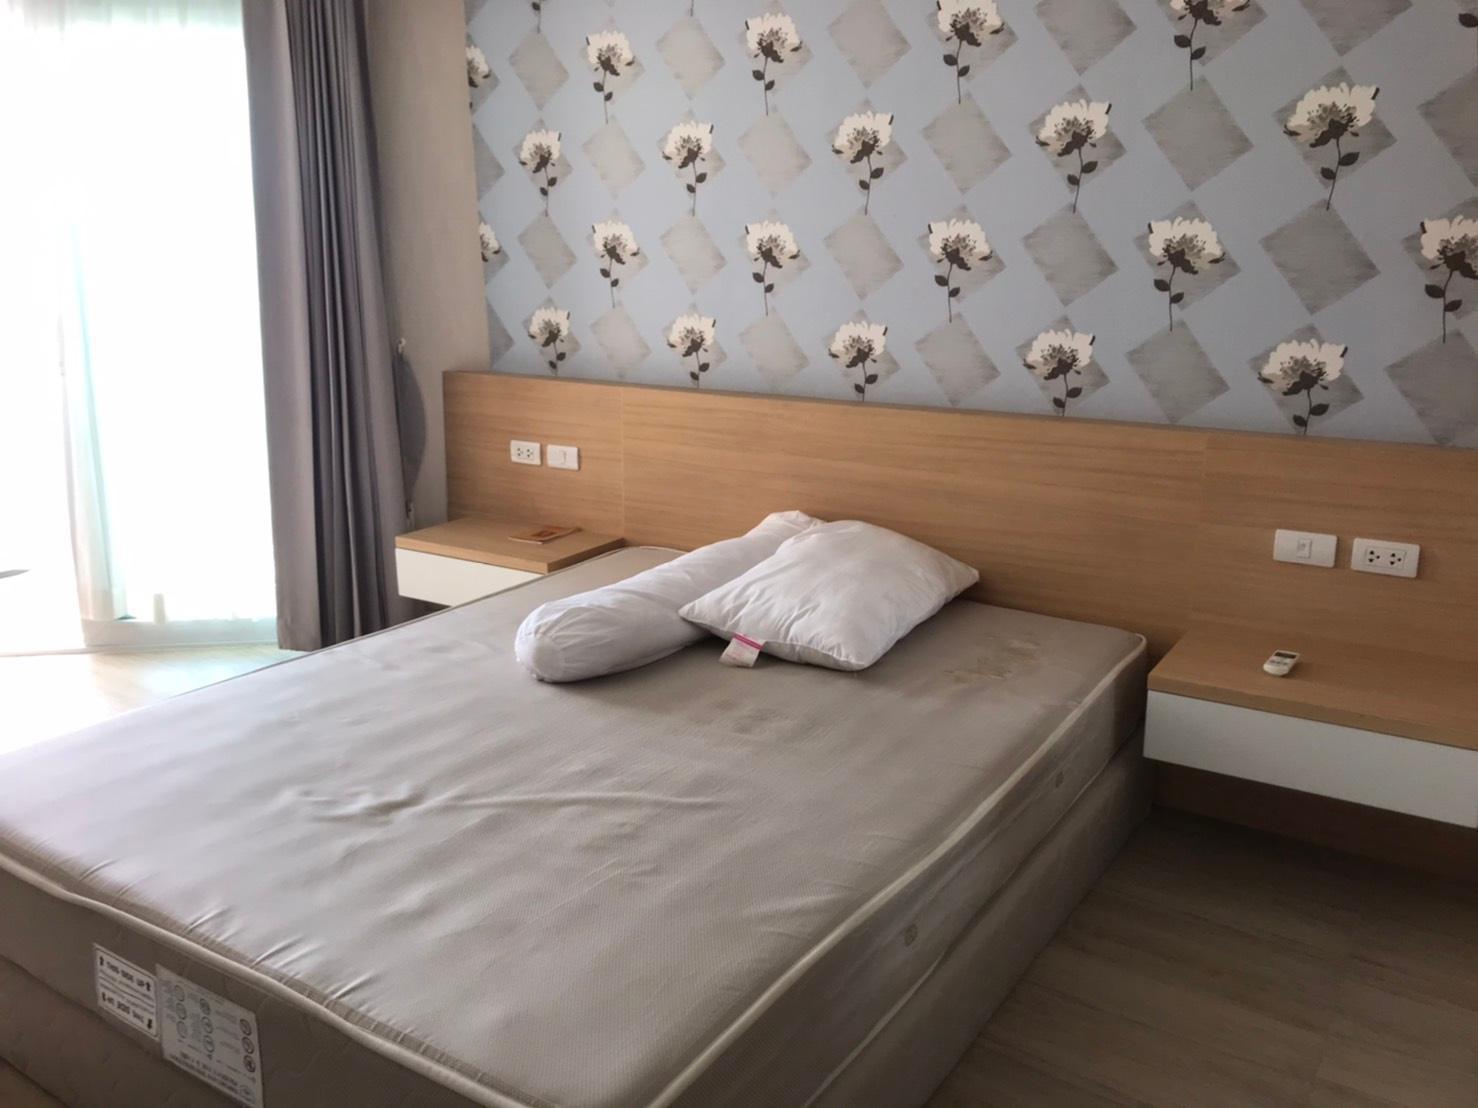 Chayayon condominium, Suthep, Chiangmai อพาร์ตเมนต์ 1 ห้องนอน 1 ห้องน้ำส่วนตัว ขนาด 33 ตร.ม. – สุเทพ